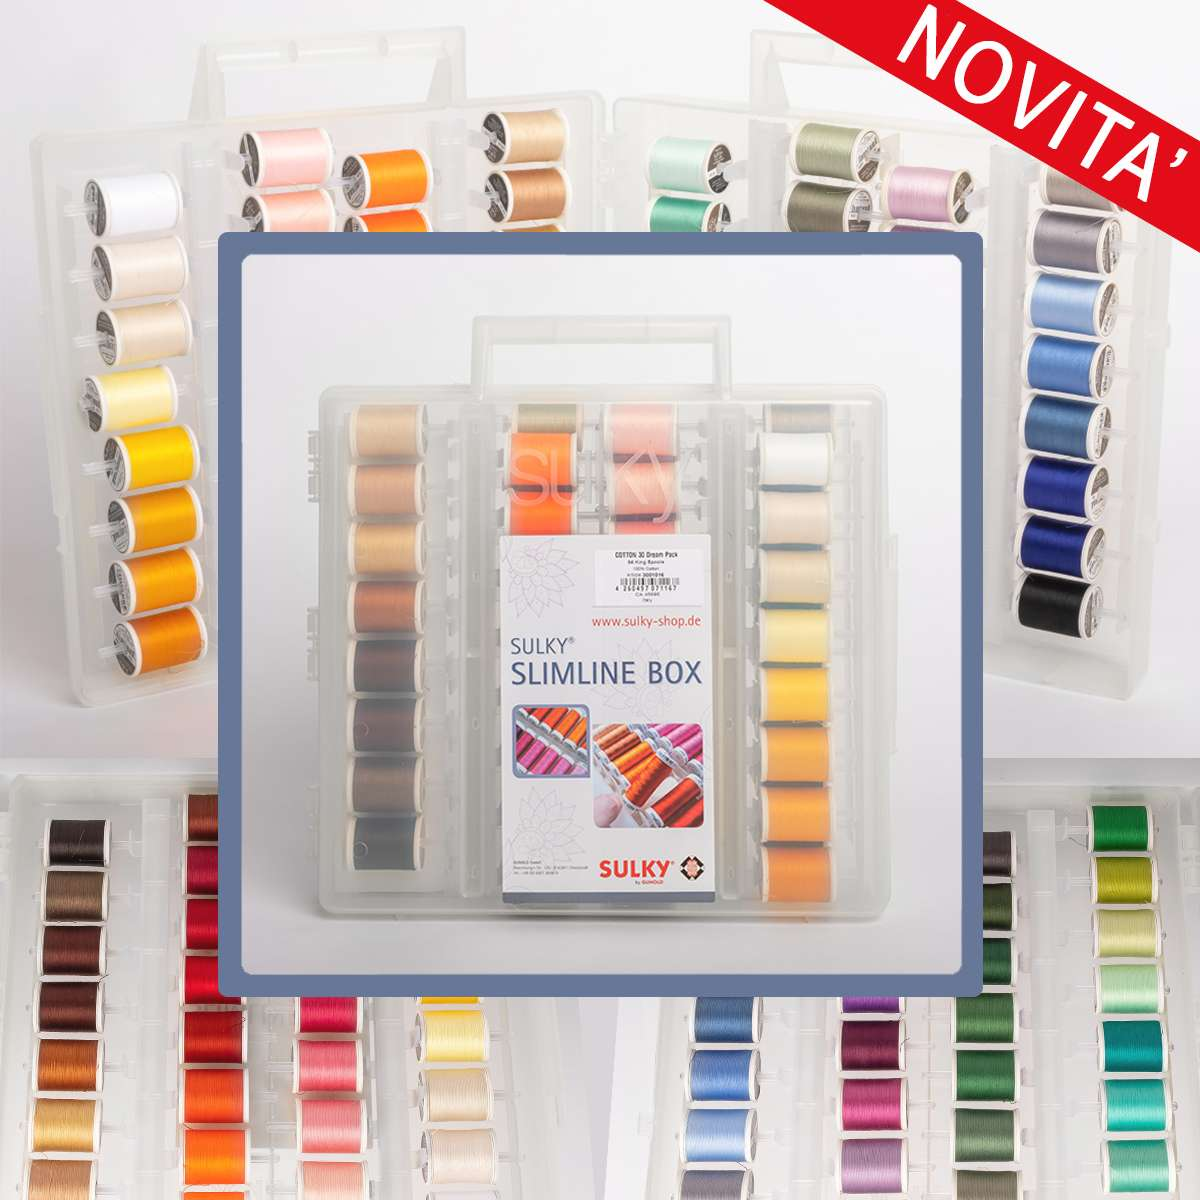 NOVITA' Kit Slimline box